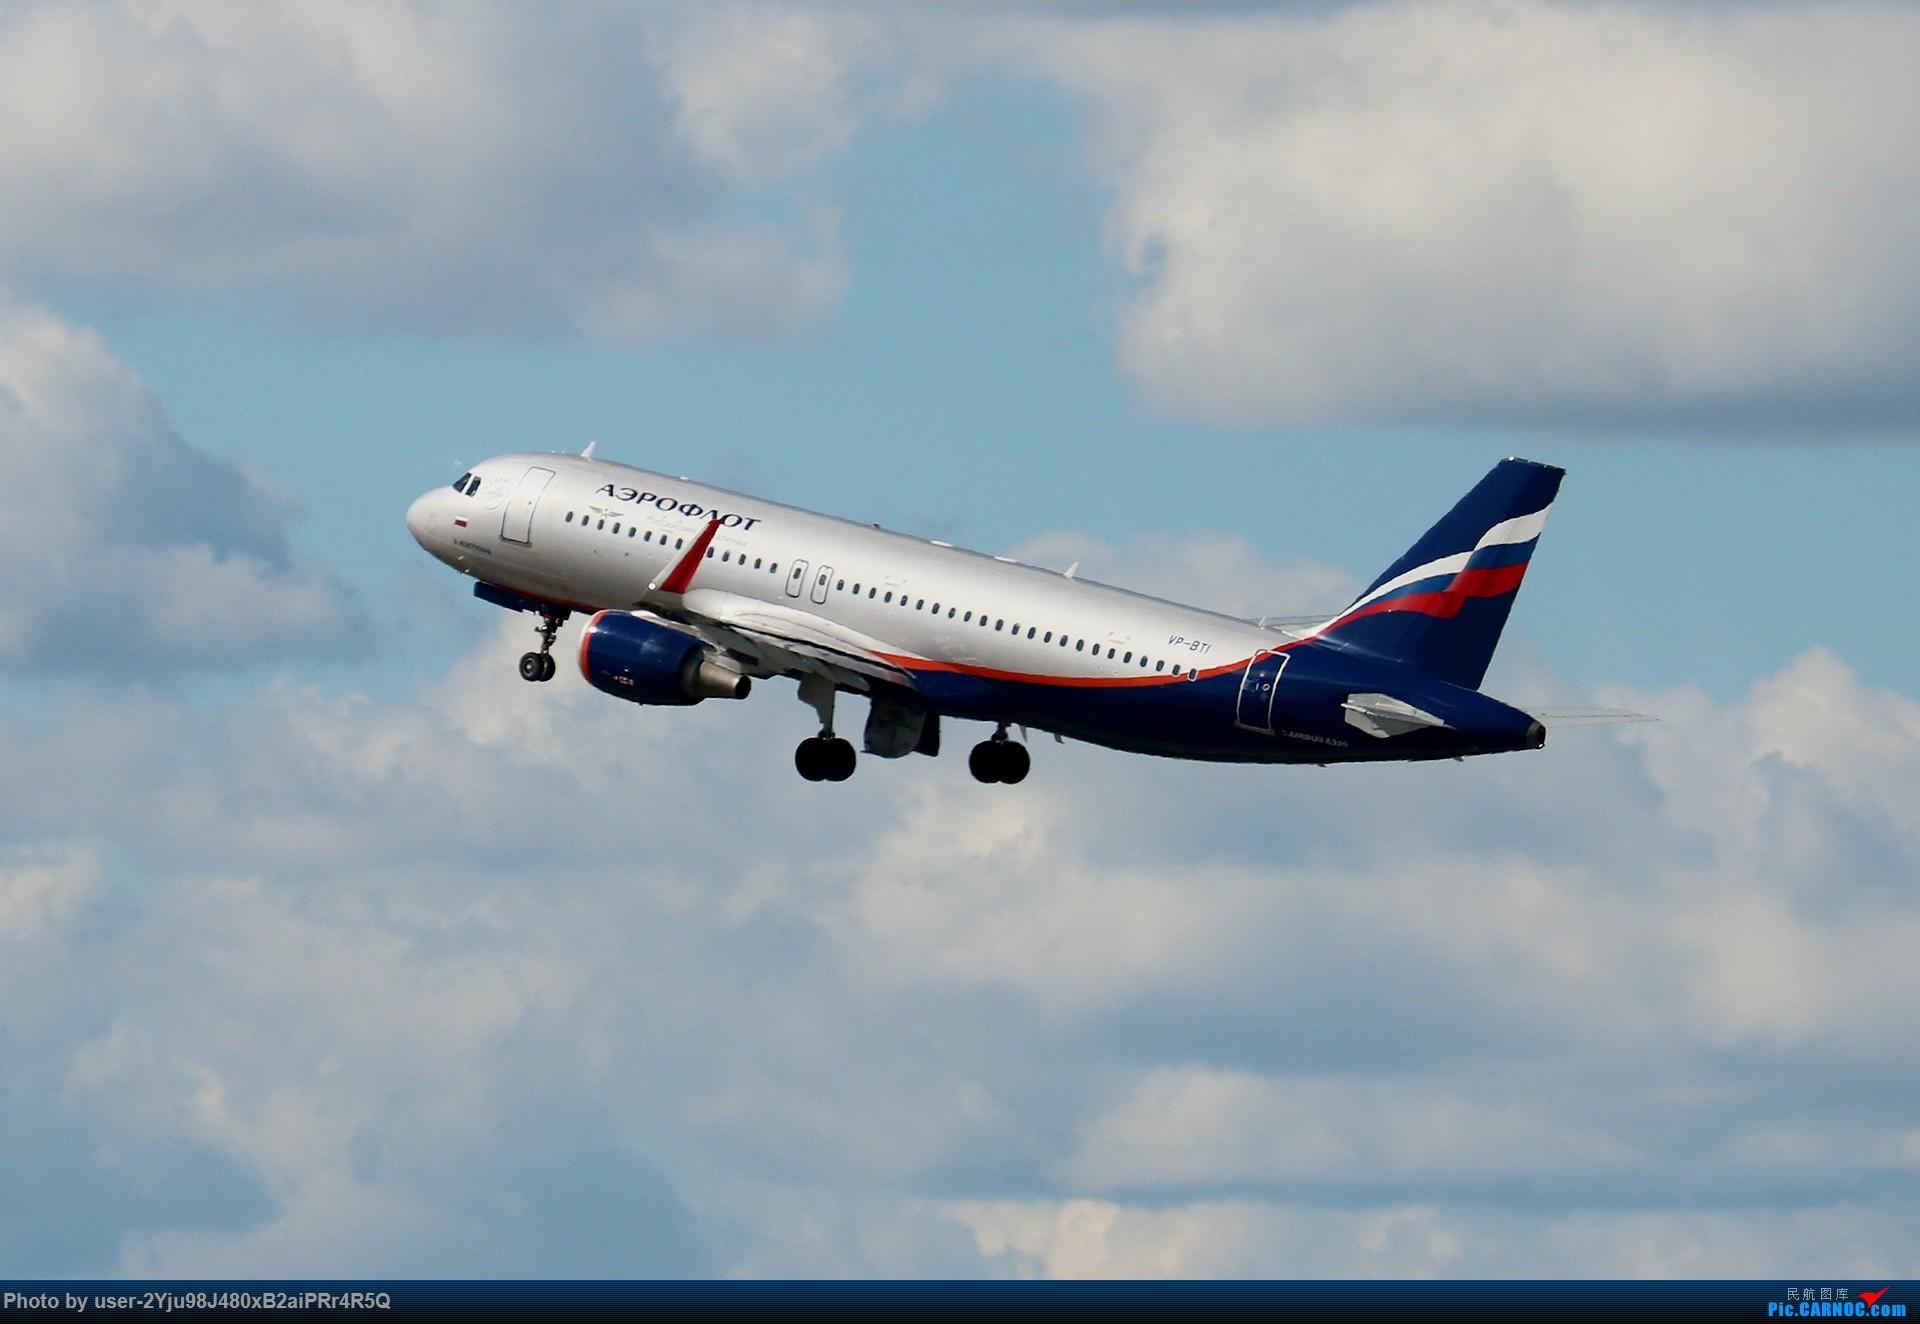 Re:[原创]LIULIU|Sheremetyevo的漫游|其他篇 AIRBUS A320-214(SL) VP-BTI 俄罗斯谢诺梅杰沃机场